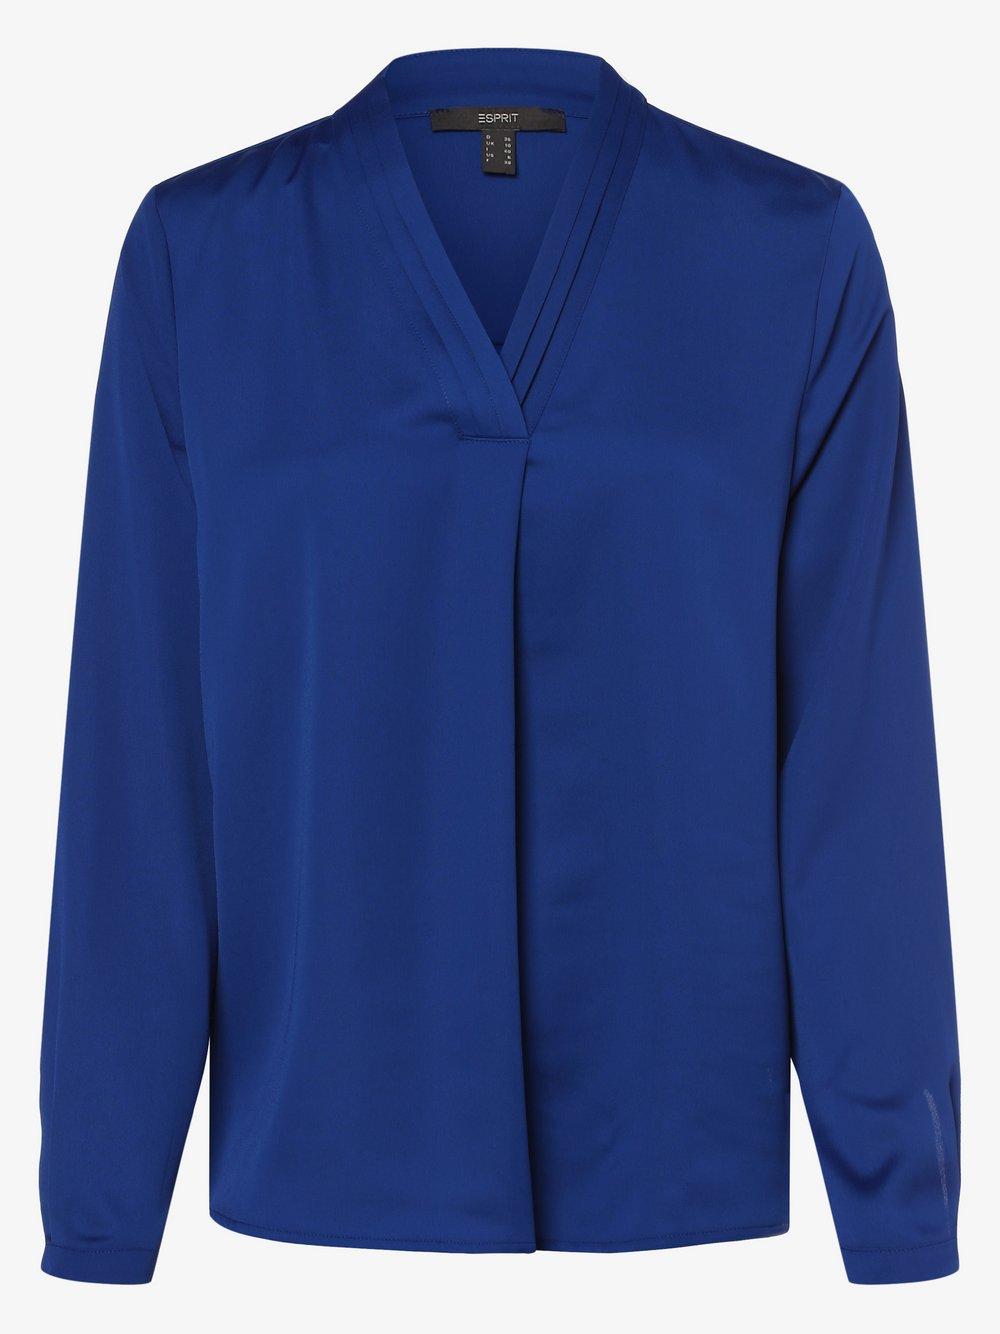 Esprit Collection – Bluzka damska, niebieski Van Graaf 496223-0001